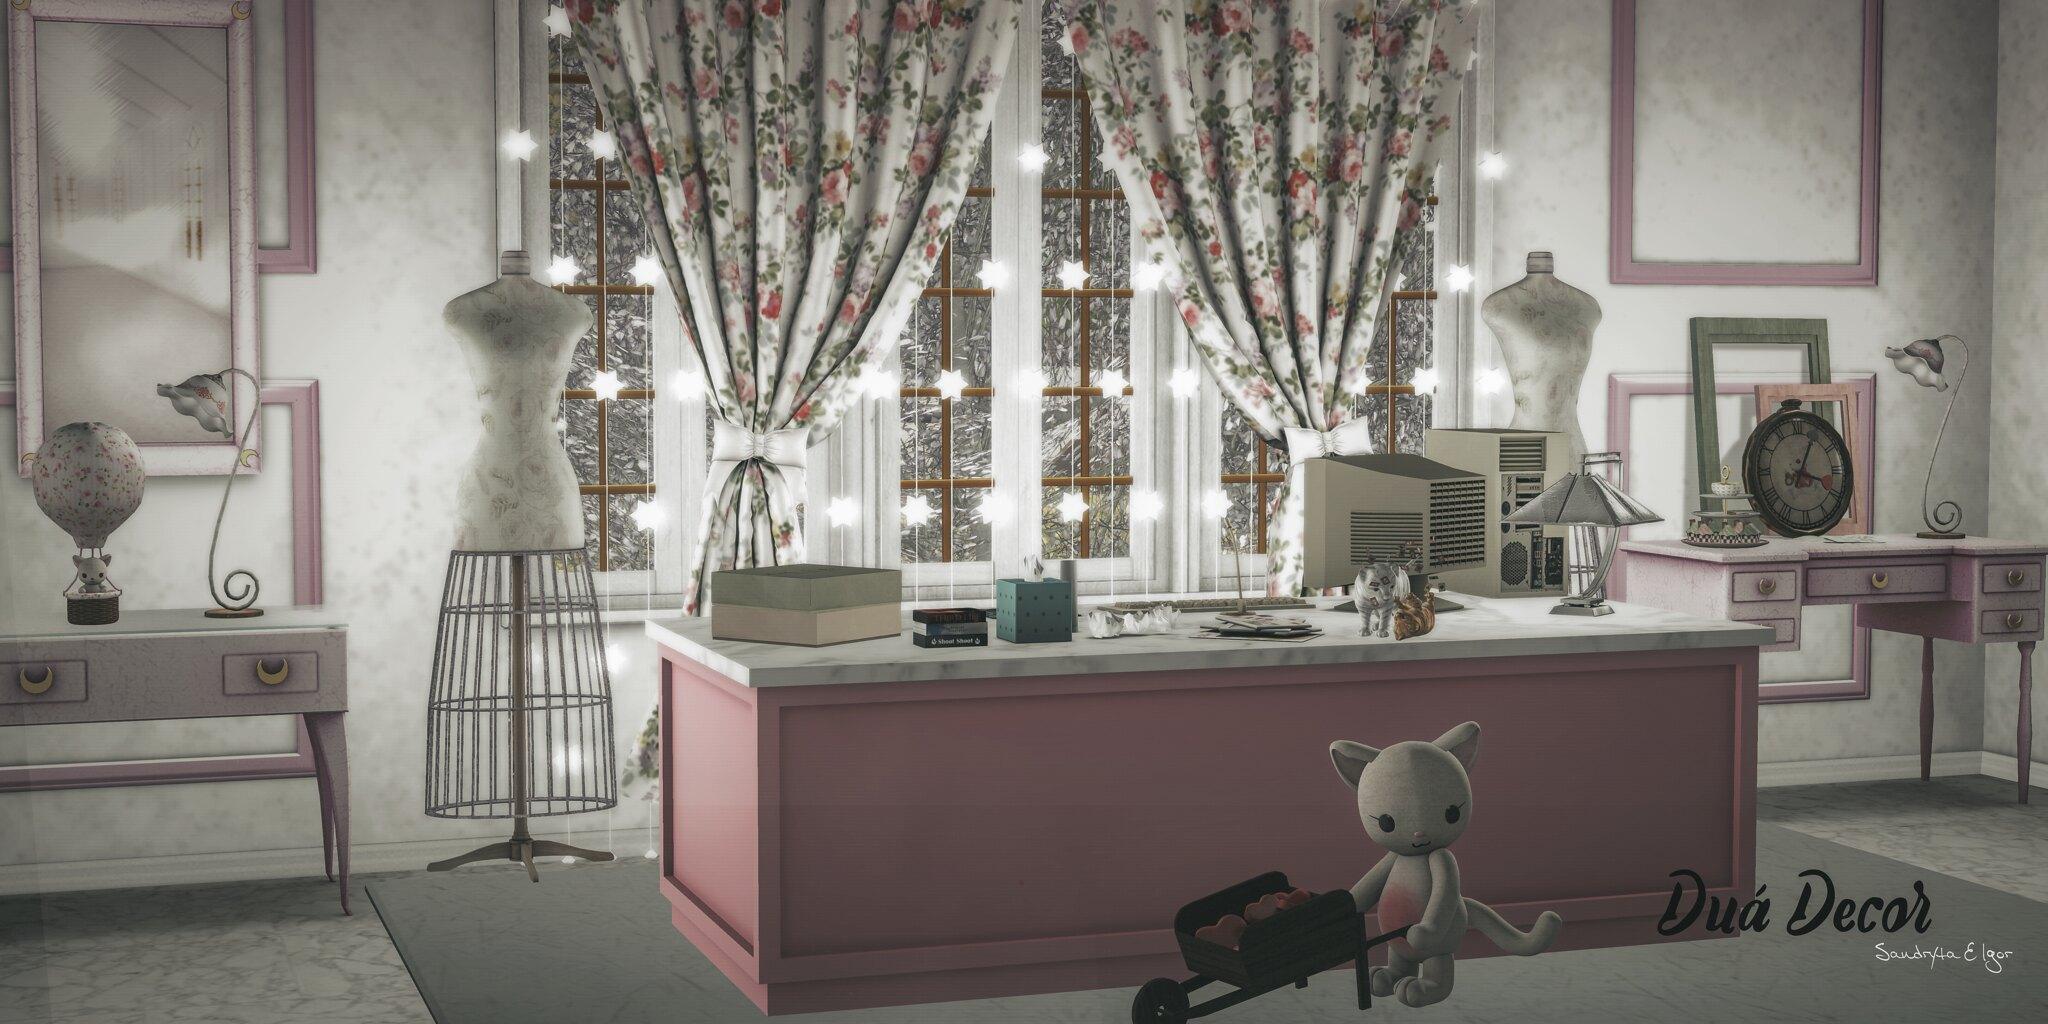 POST🔥 #647 | Olive | Fiasco | Diamantis | Serenity Style | DH | Cb | YD | KITE | Peaches | Cherry House | The gacha Garden | Shiny Shabby | The epiphany | TRES CHIC | Cosmopolitan |